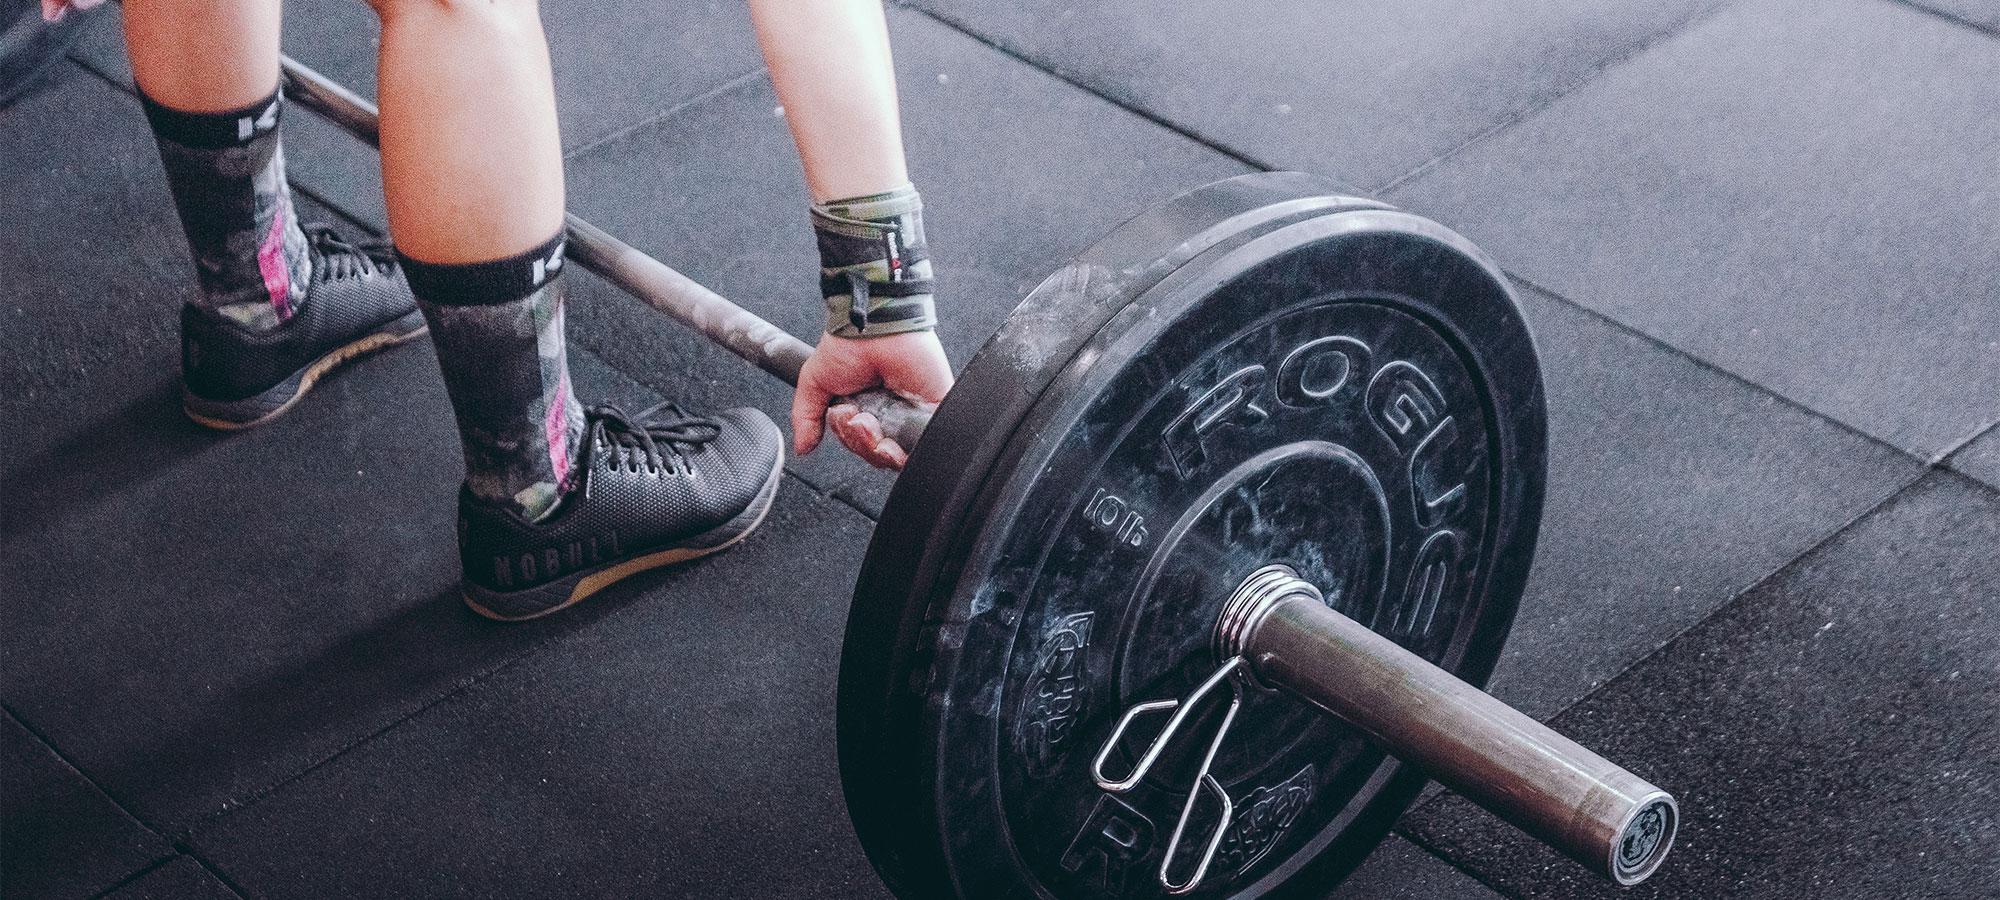 stela leder och muskler